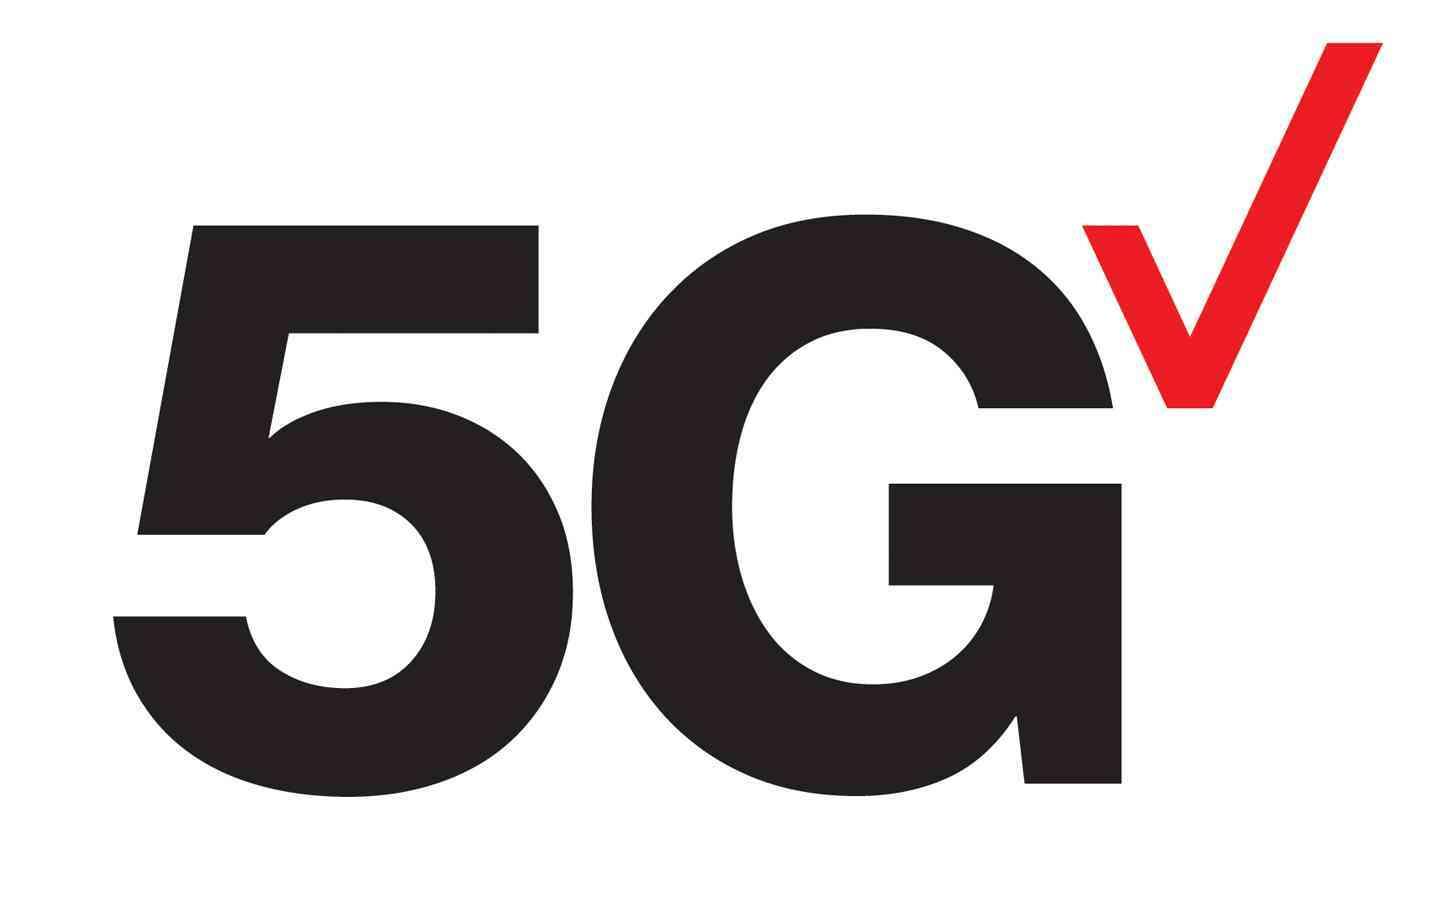 Verizon's 5G logo